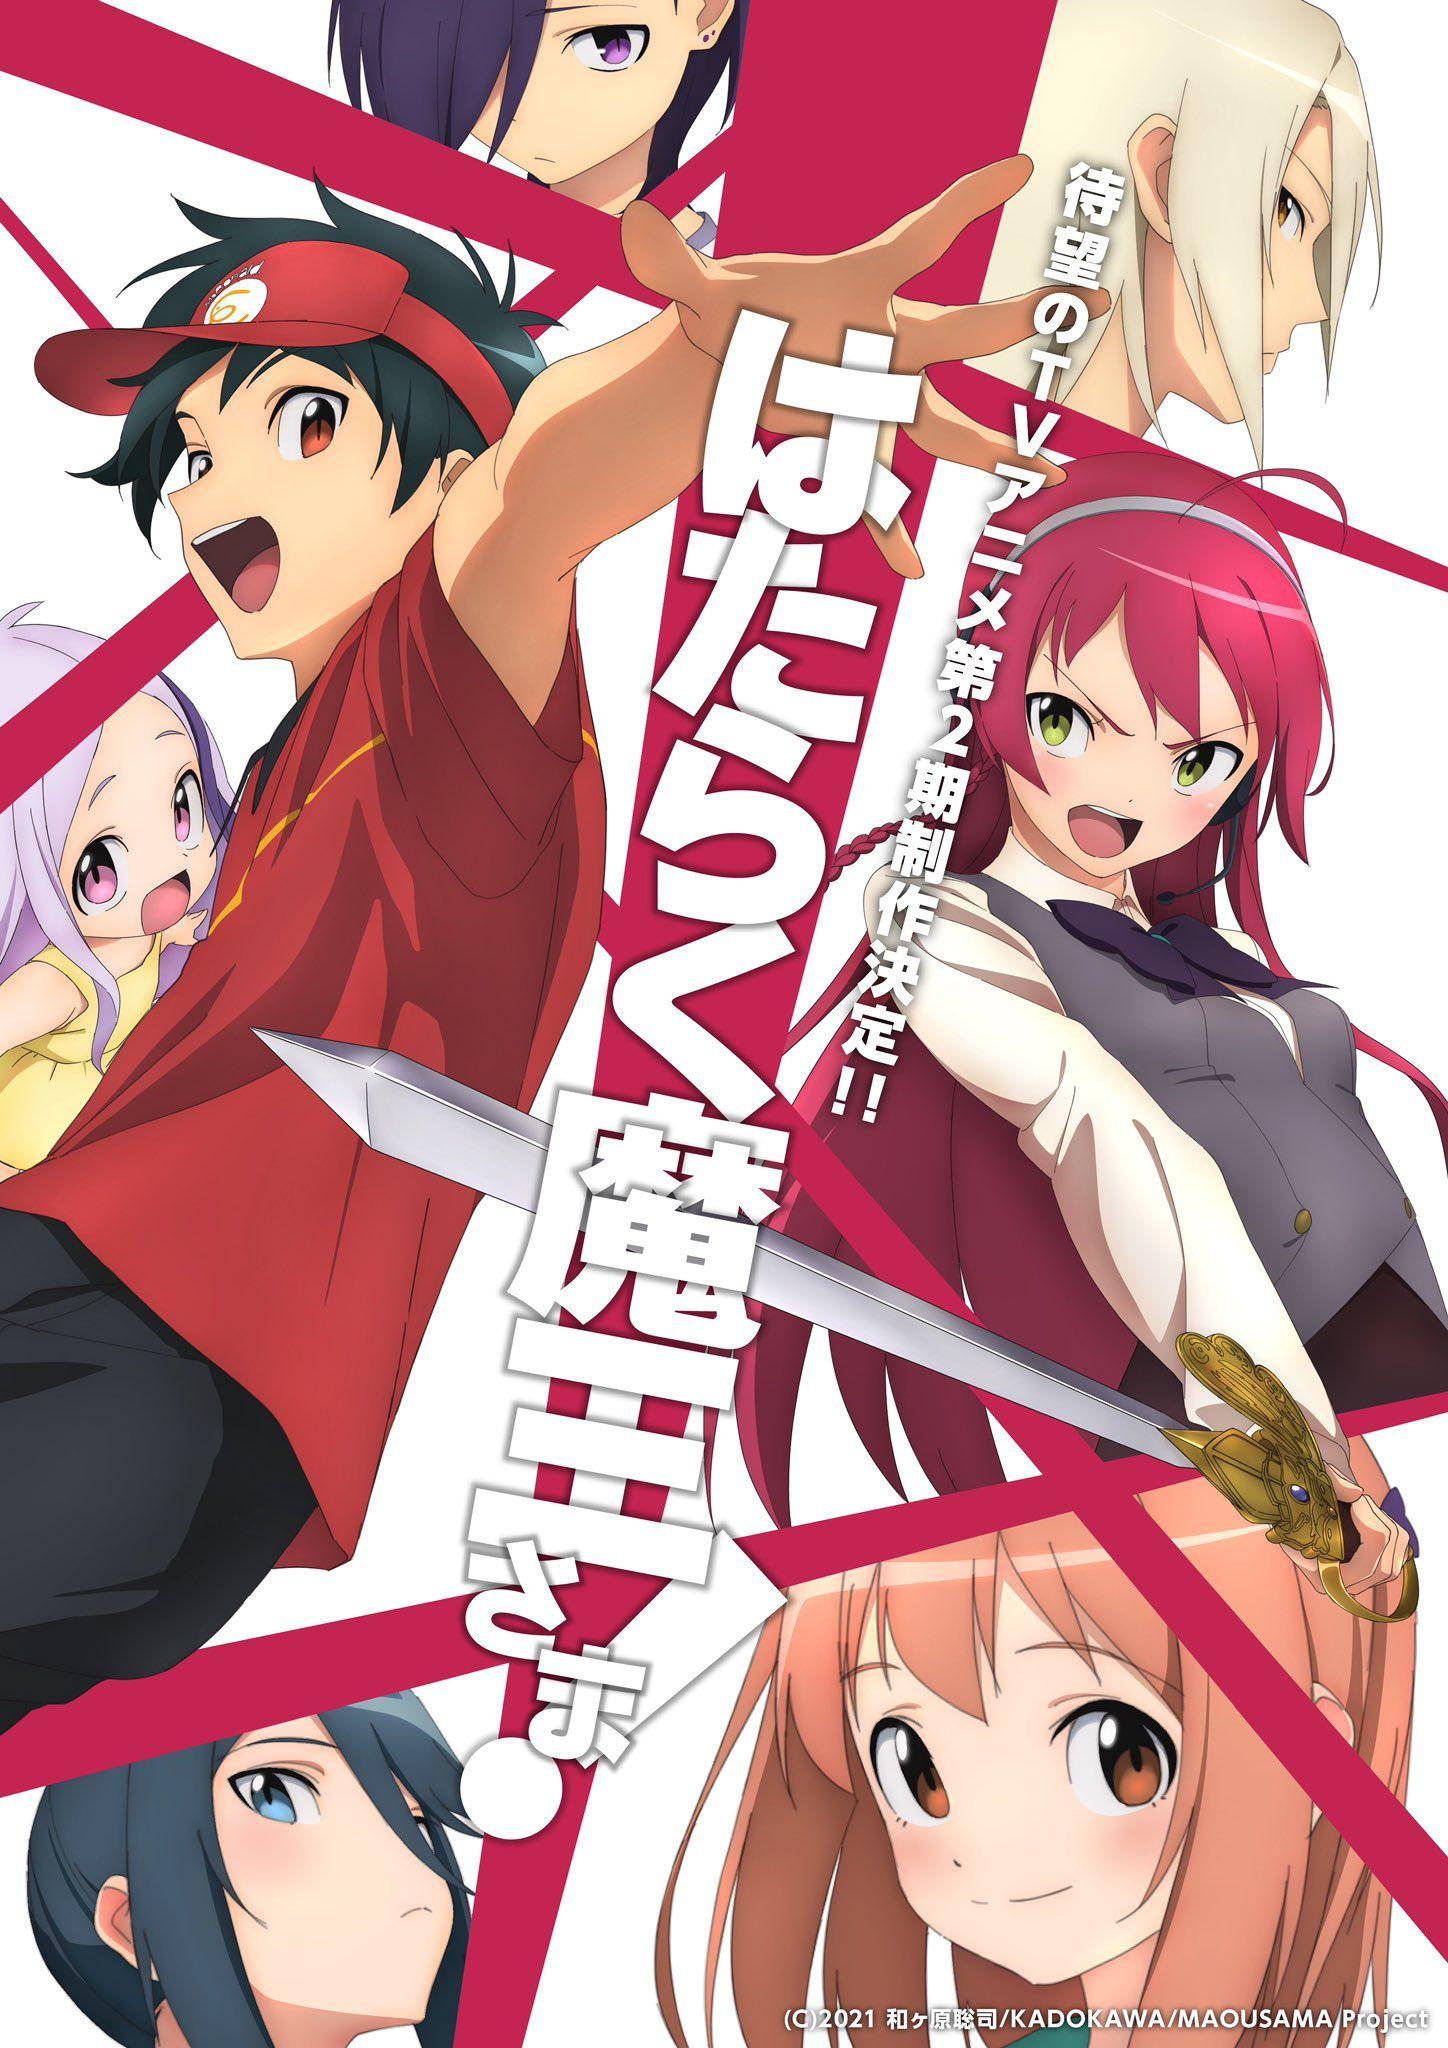 67 Anime Previews Ideas In 2021 Anime Manga Me Me Me Anime